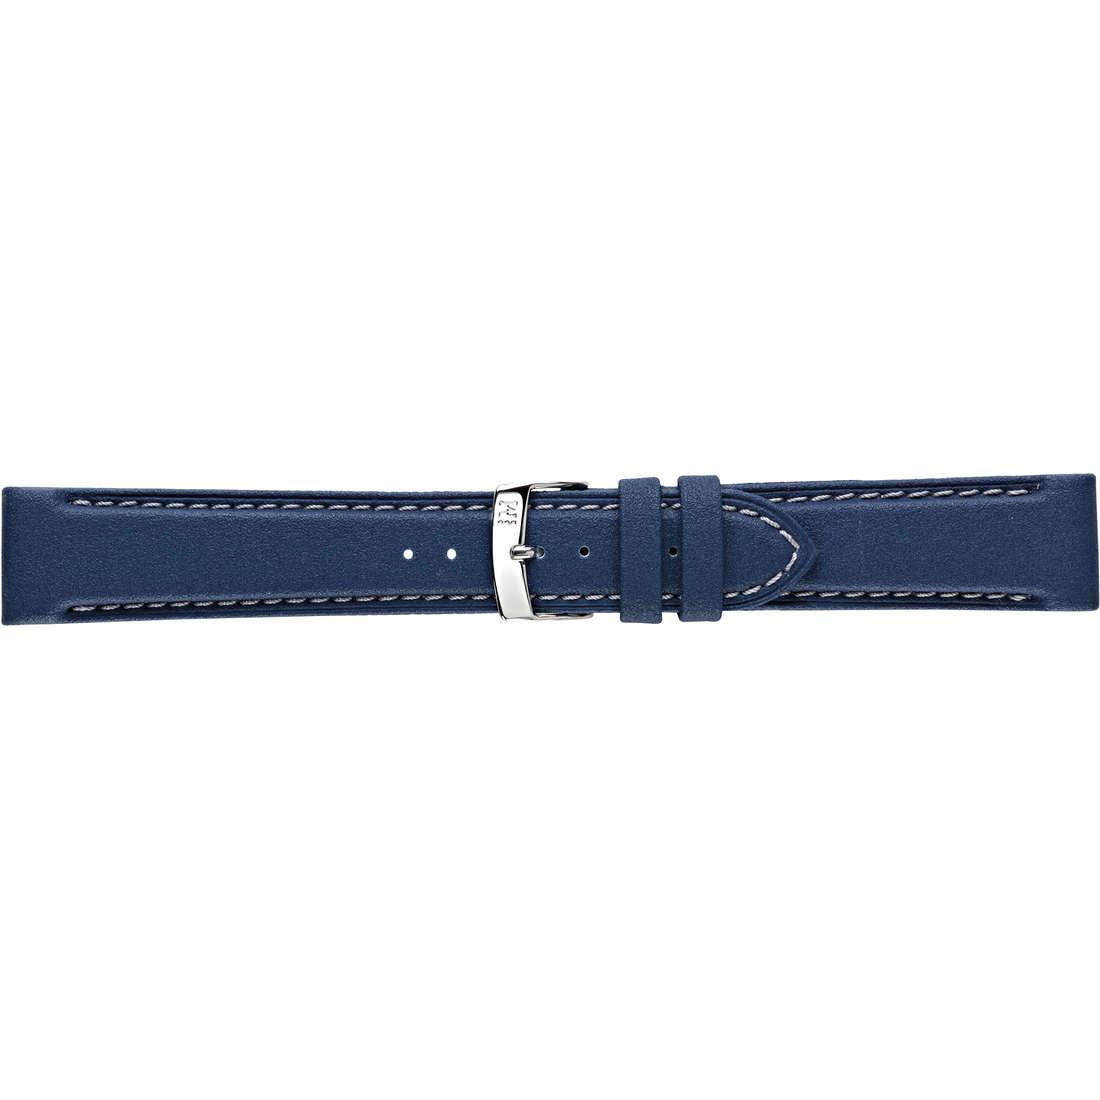 watch watch bands watch straps man Morellato Linea Sport A01U3822A42062CR18